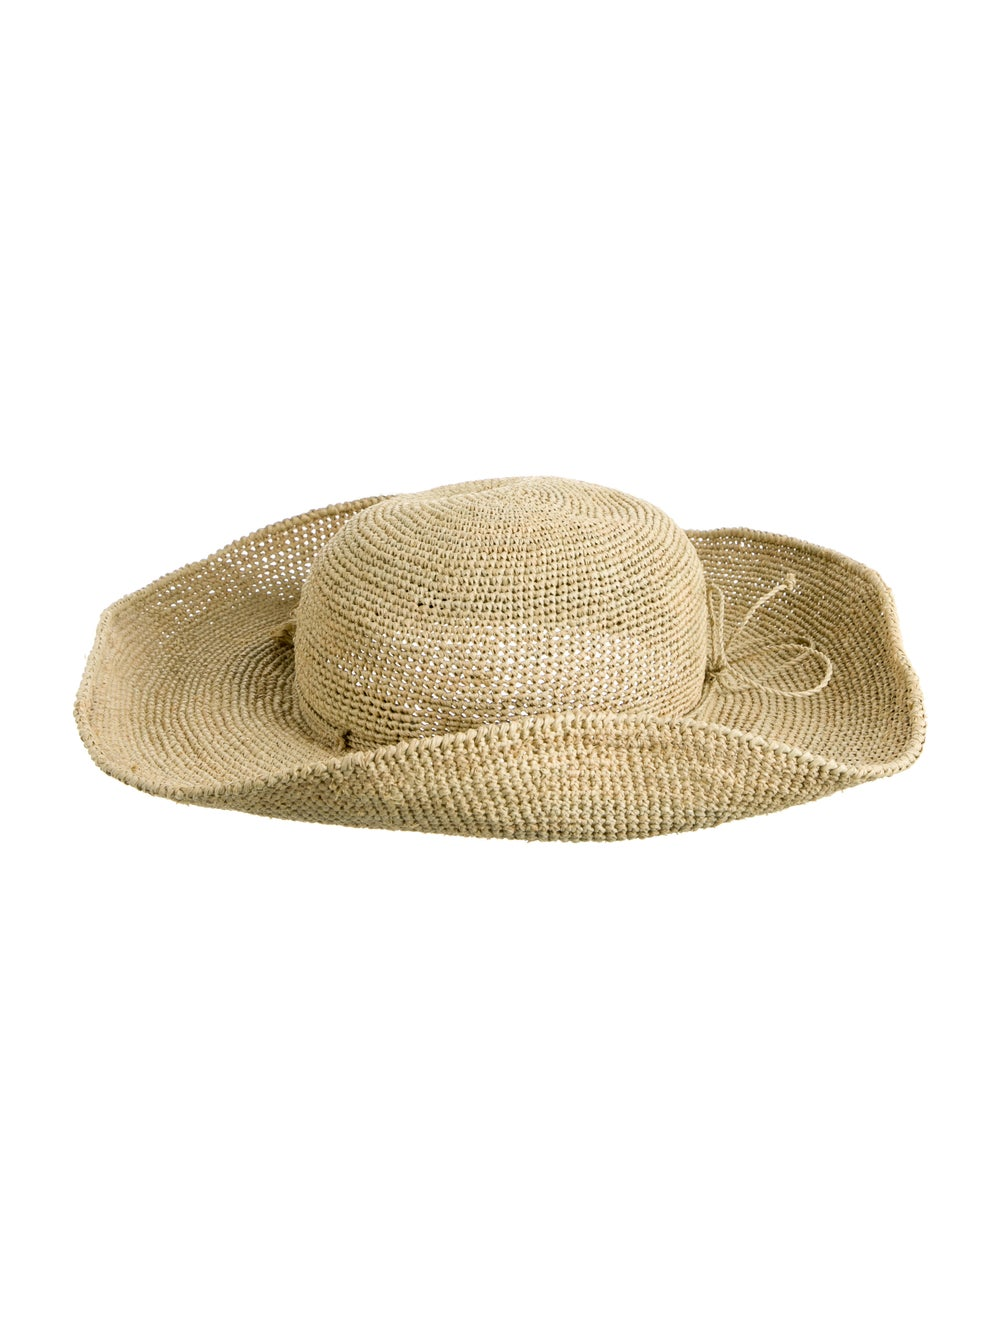 Helen Kaminski Straw Wide Brim Hat Tan - image 2